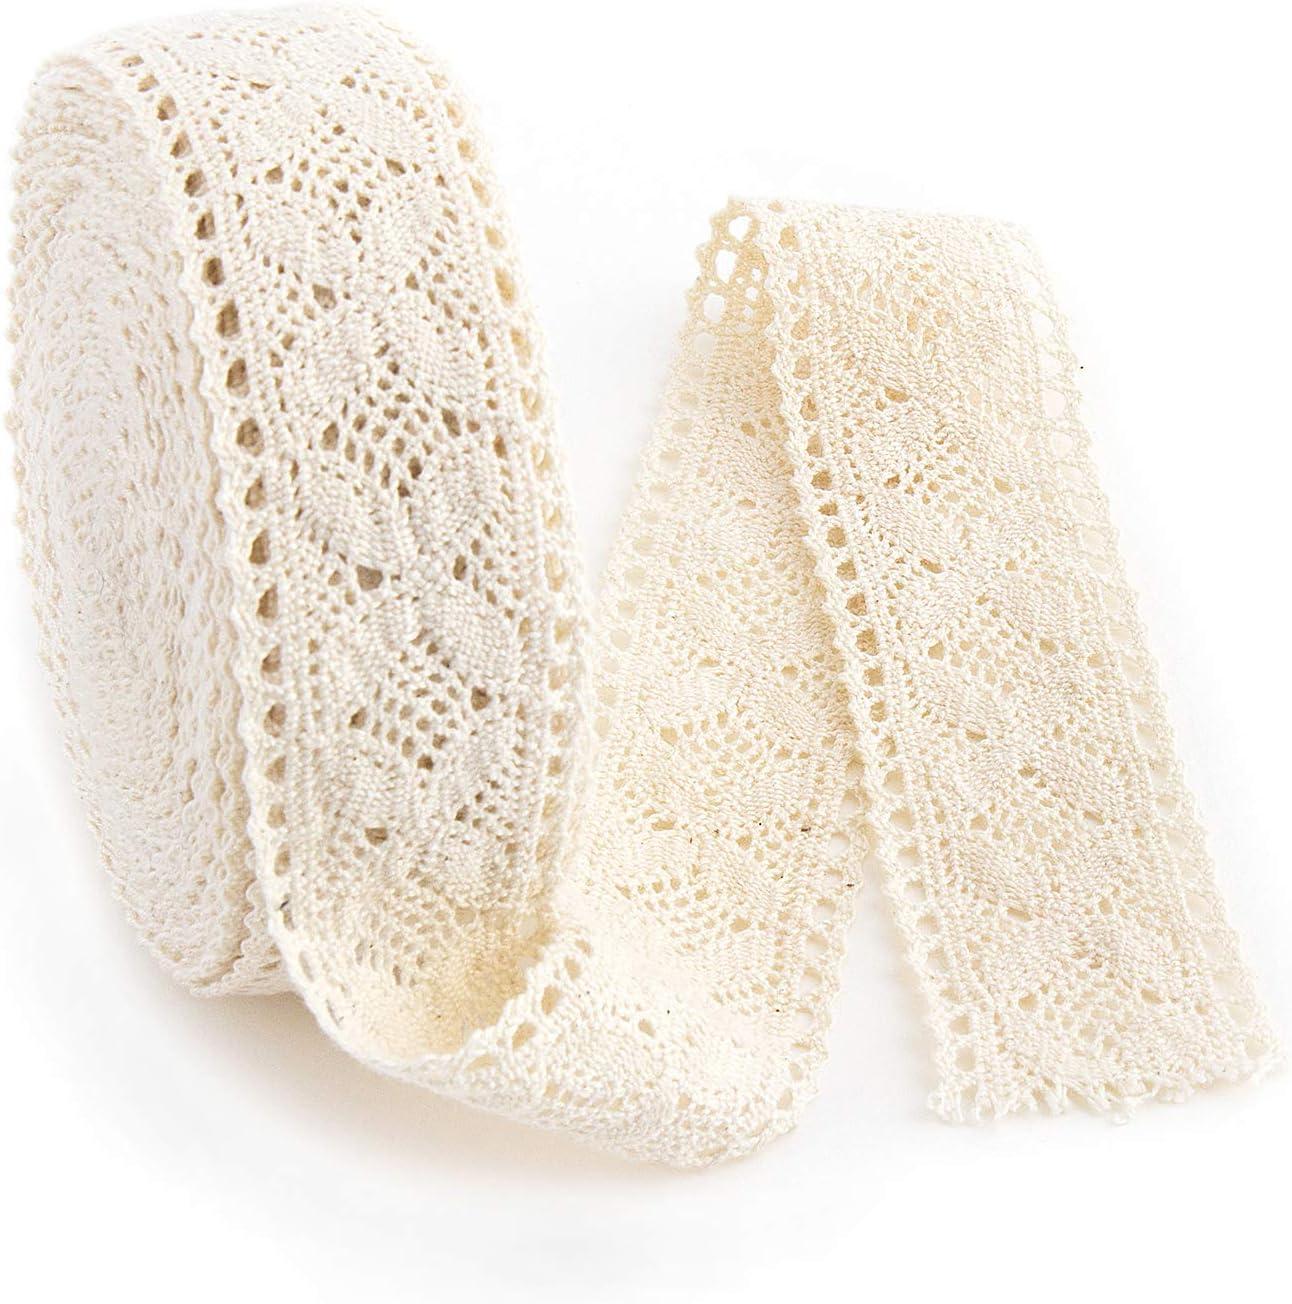 IDONGCAI Nature DIY Handmade Wedding Party Craft Gift Packing Patchwork Cotton Crocheted Lace Ribbon 1.38'' x 10yards/lot (8#)